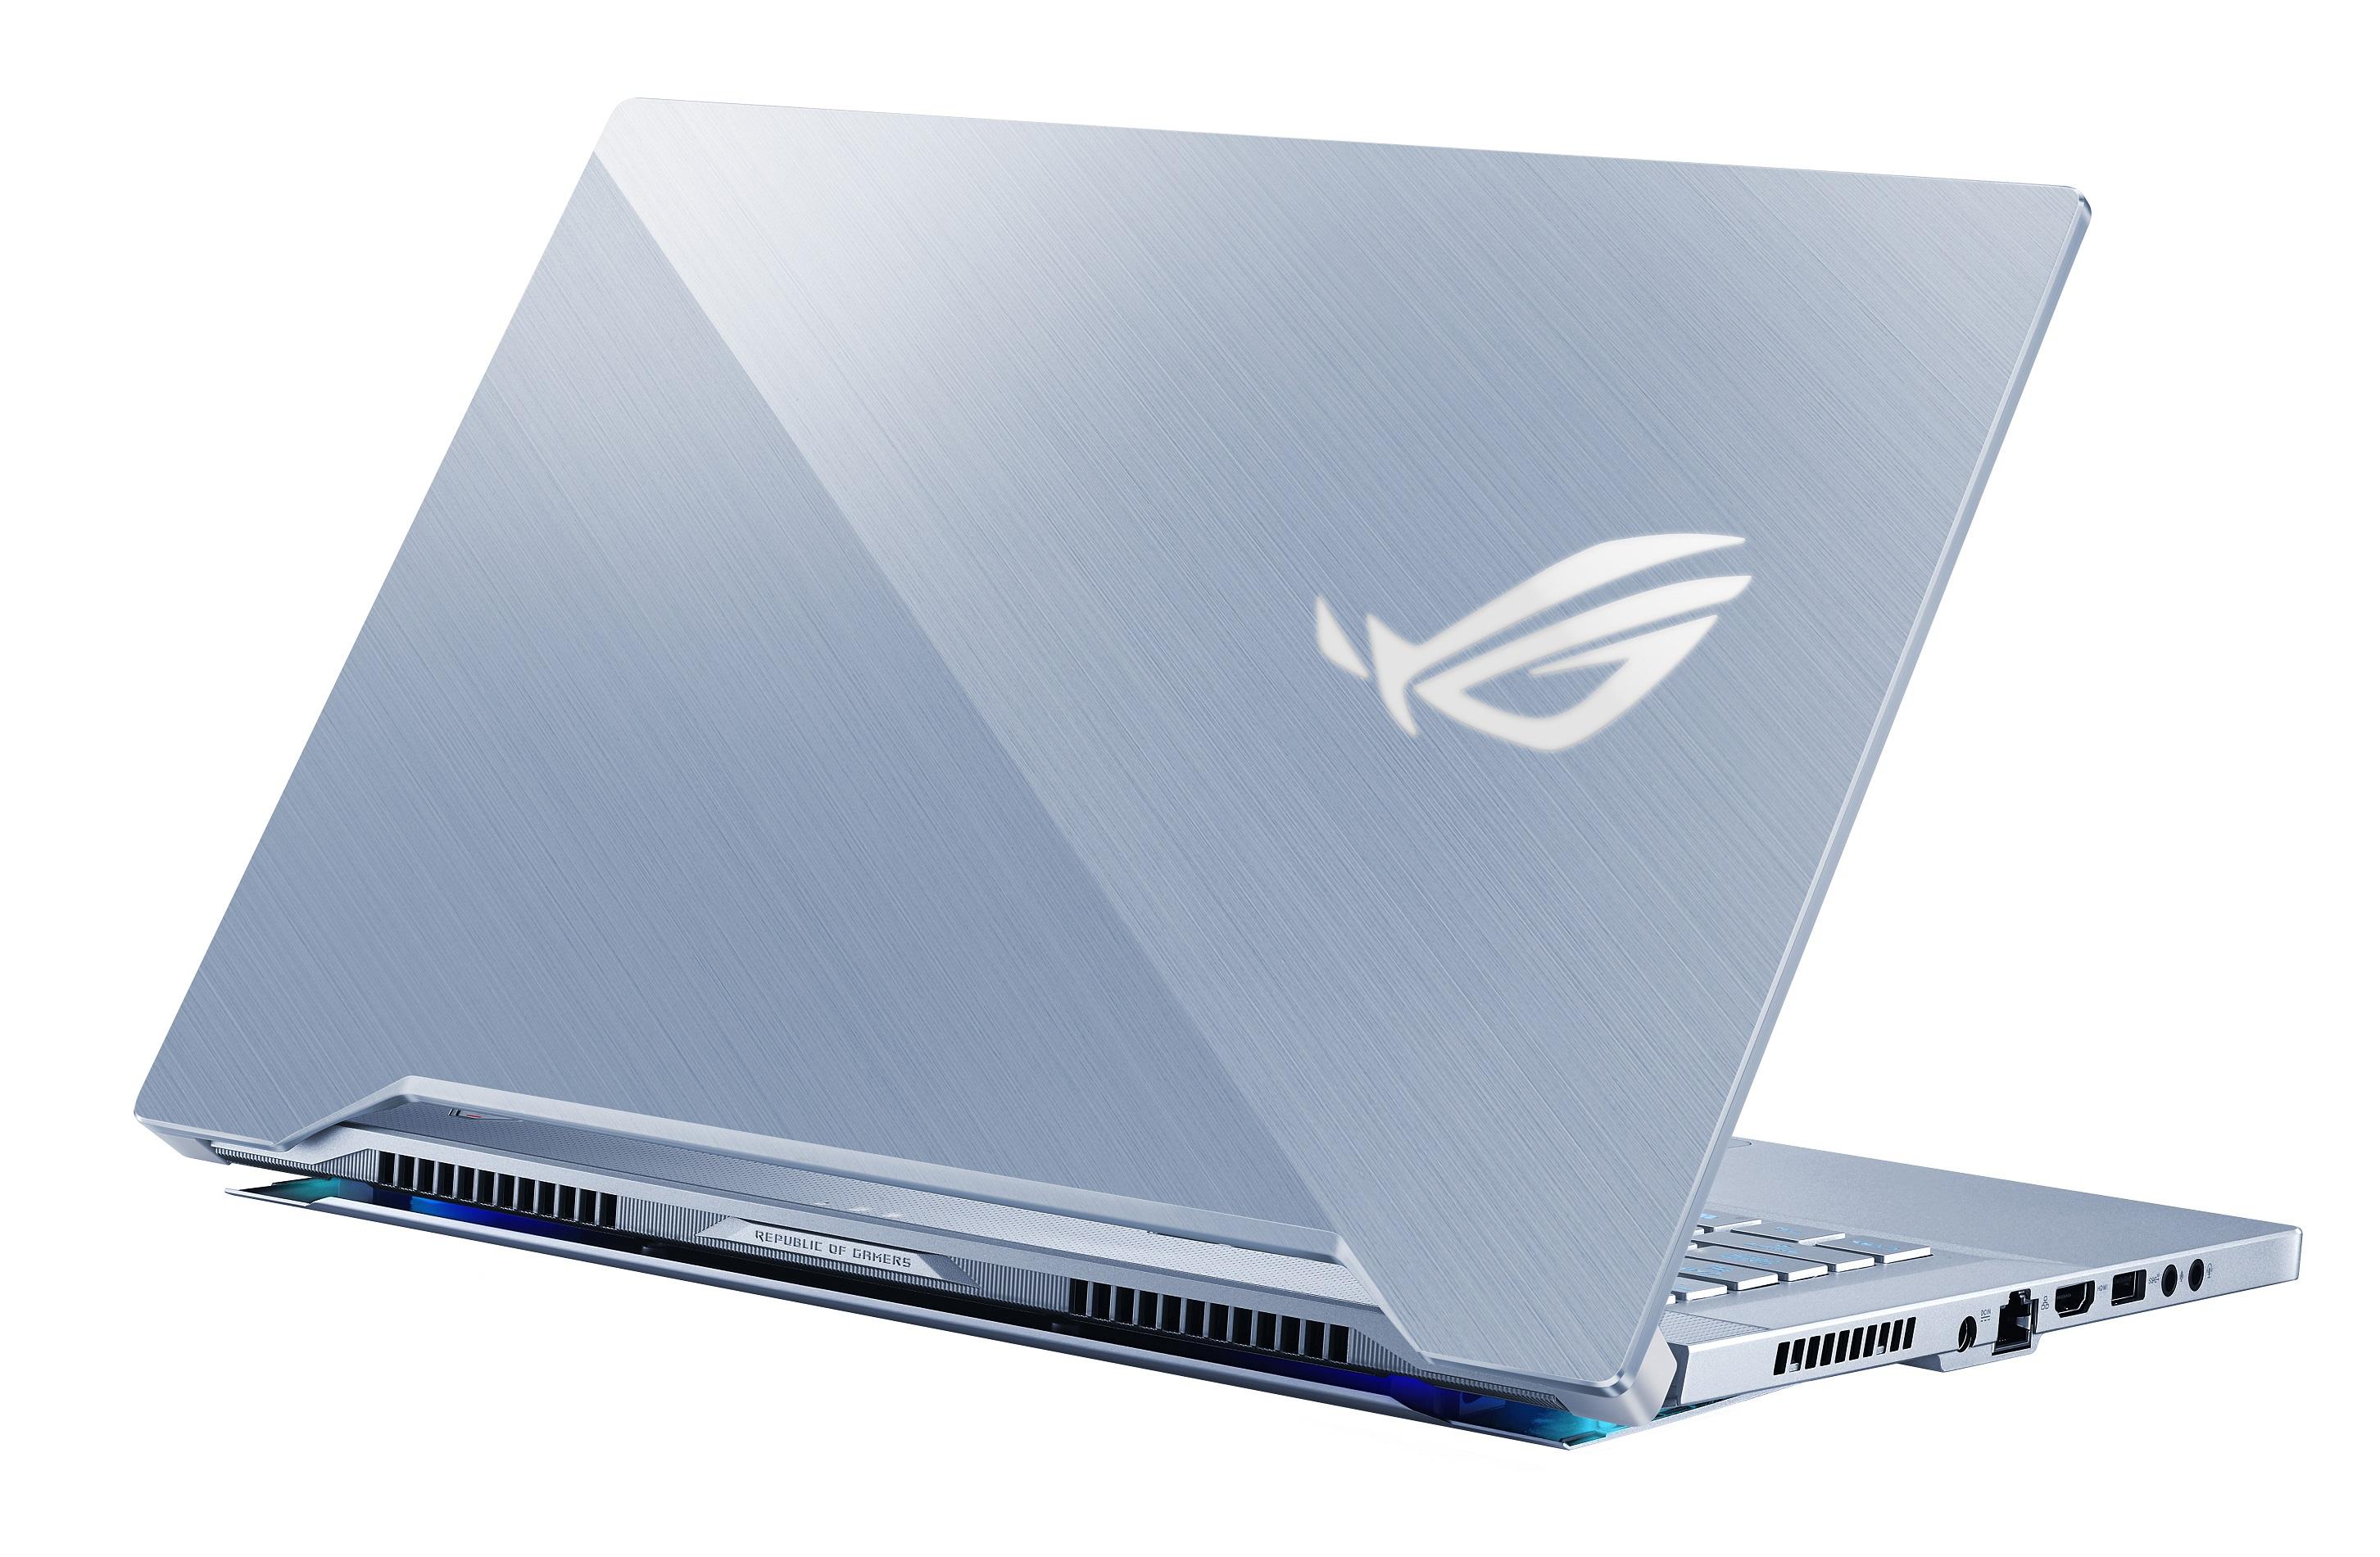 ROG Zephyrus S GX502電競筆電(冰河藍)NT$69,900起。